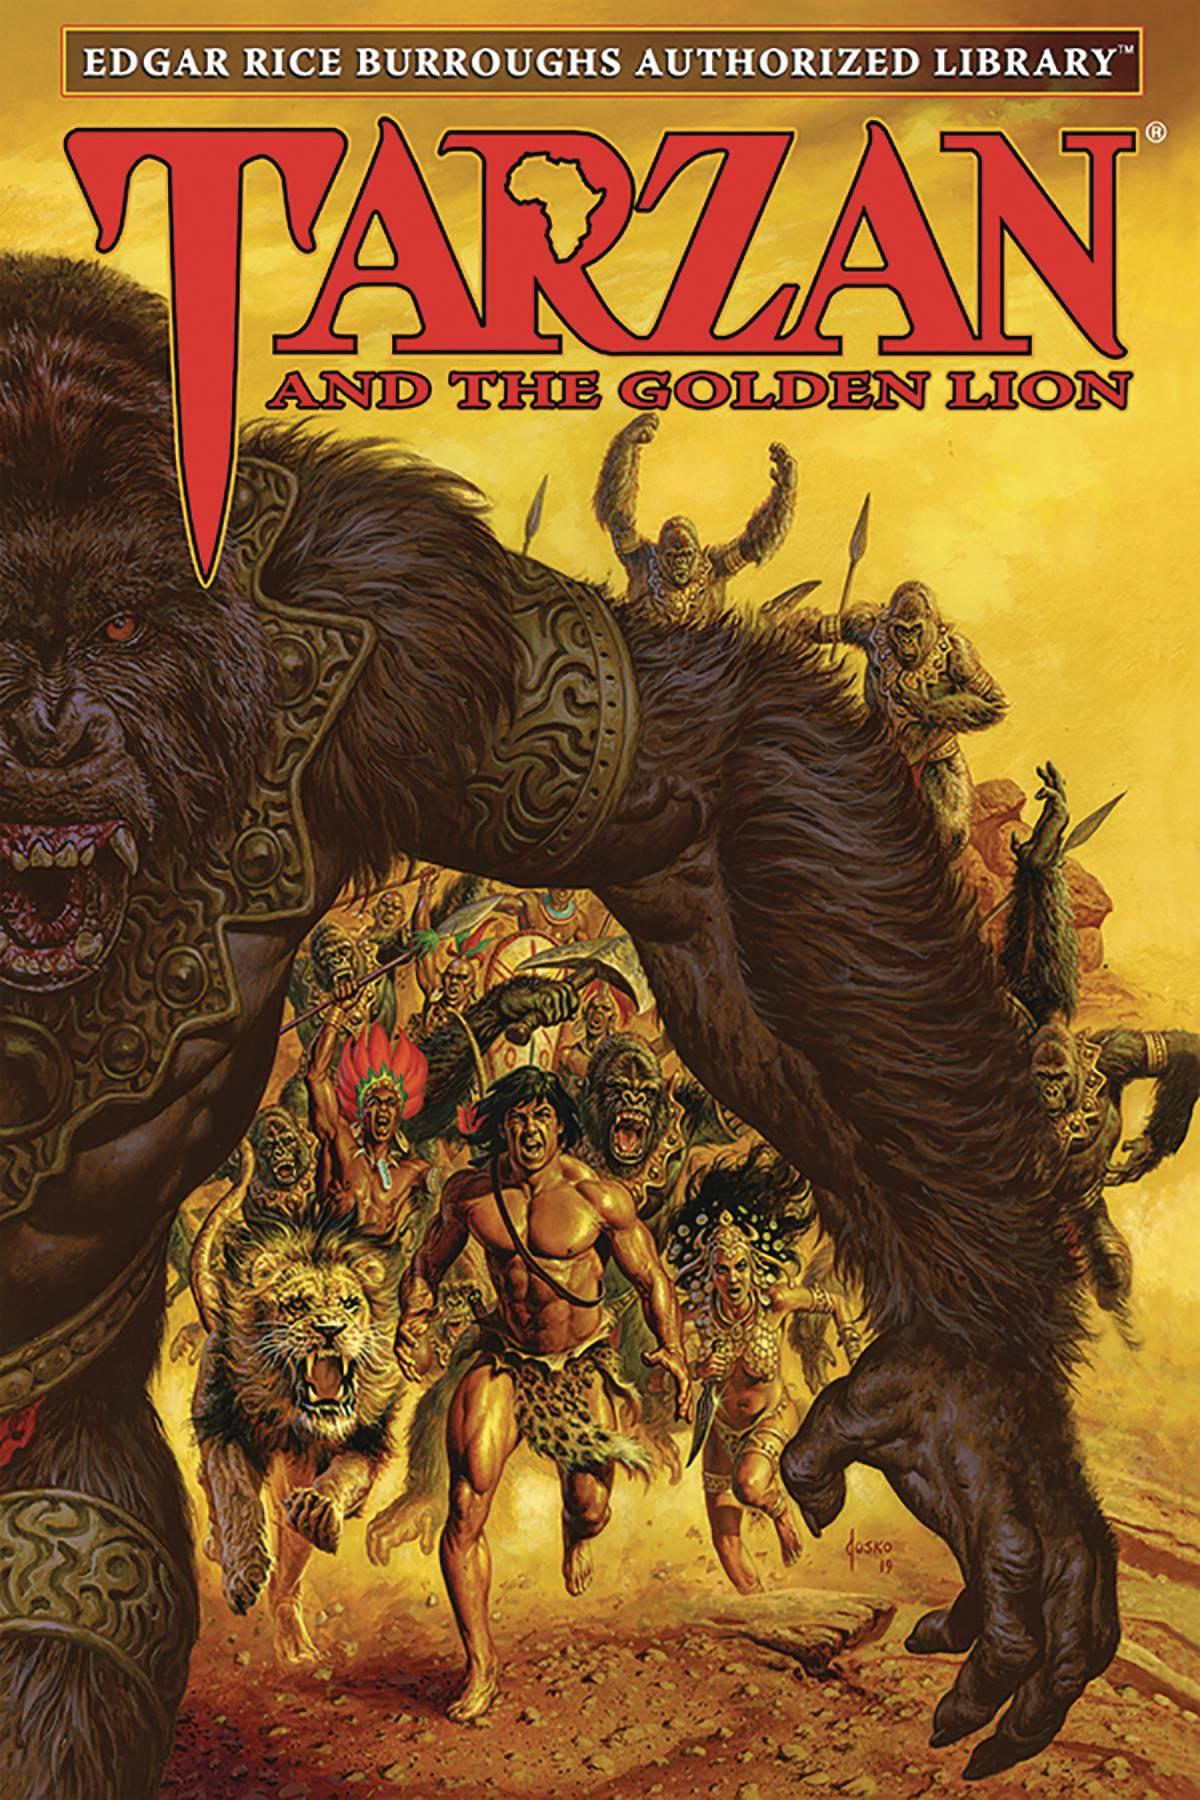 ERB AUTH LIB TARZAN HC 09 TARZAN & GOLDEN LION